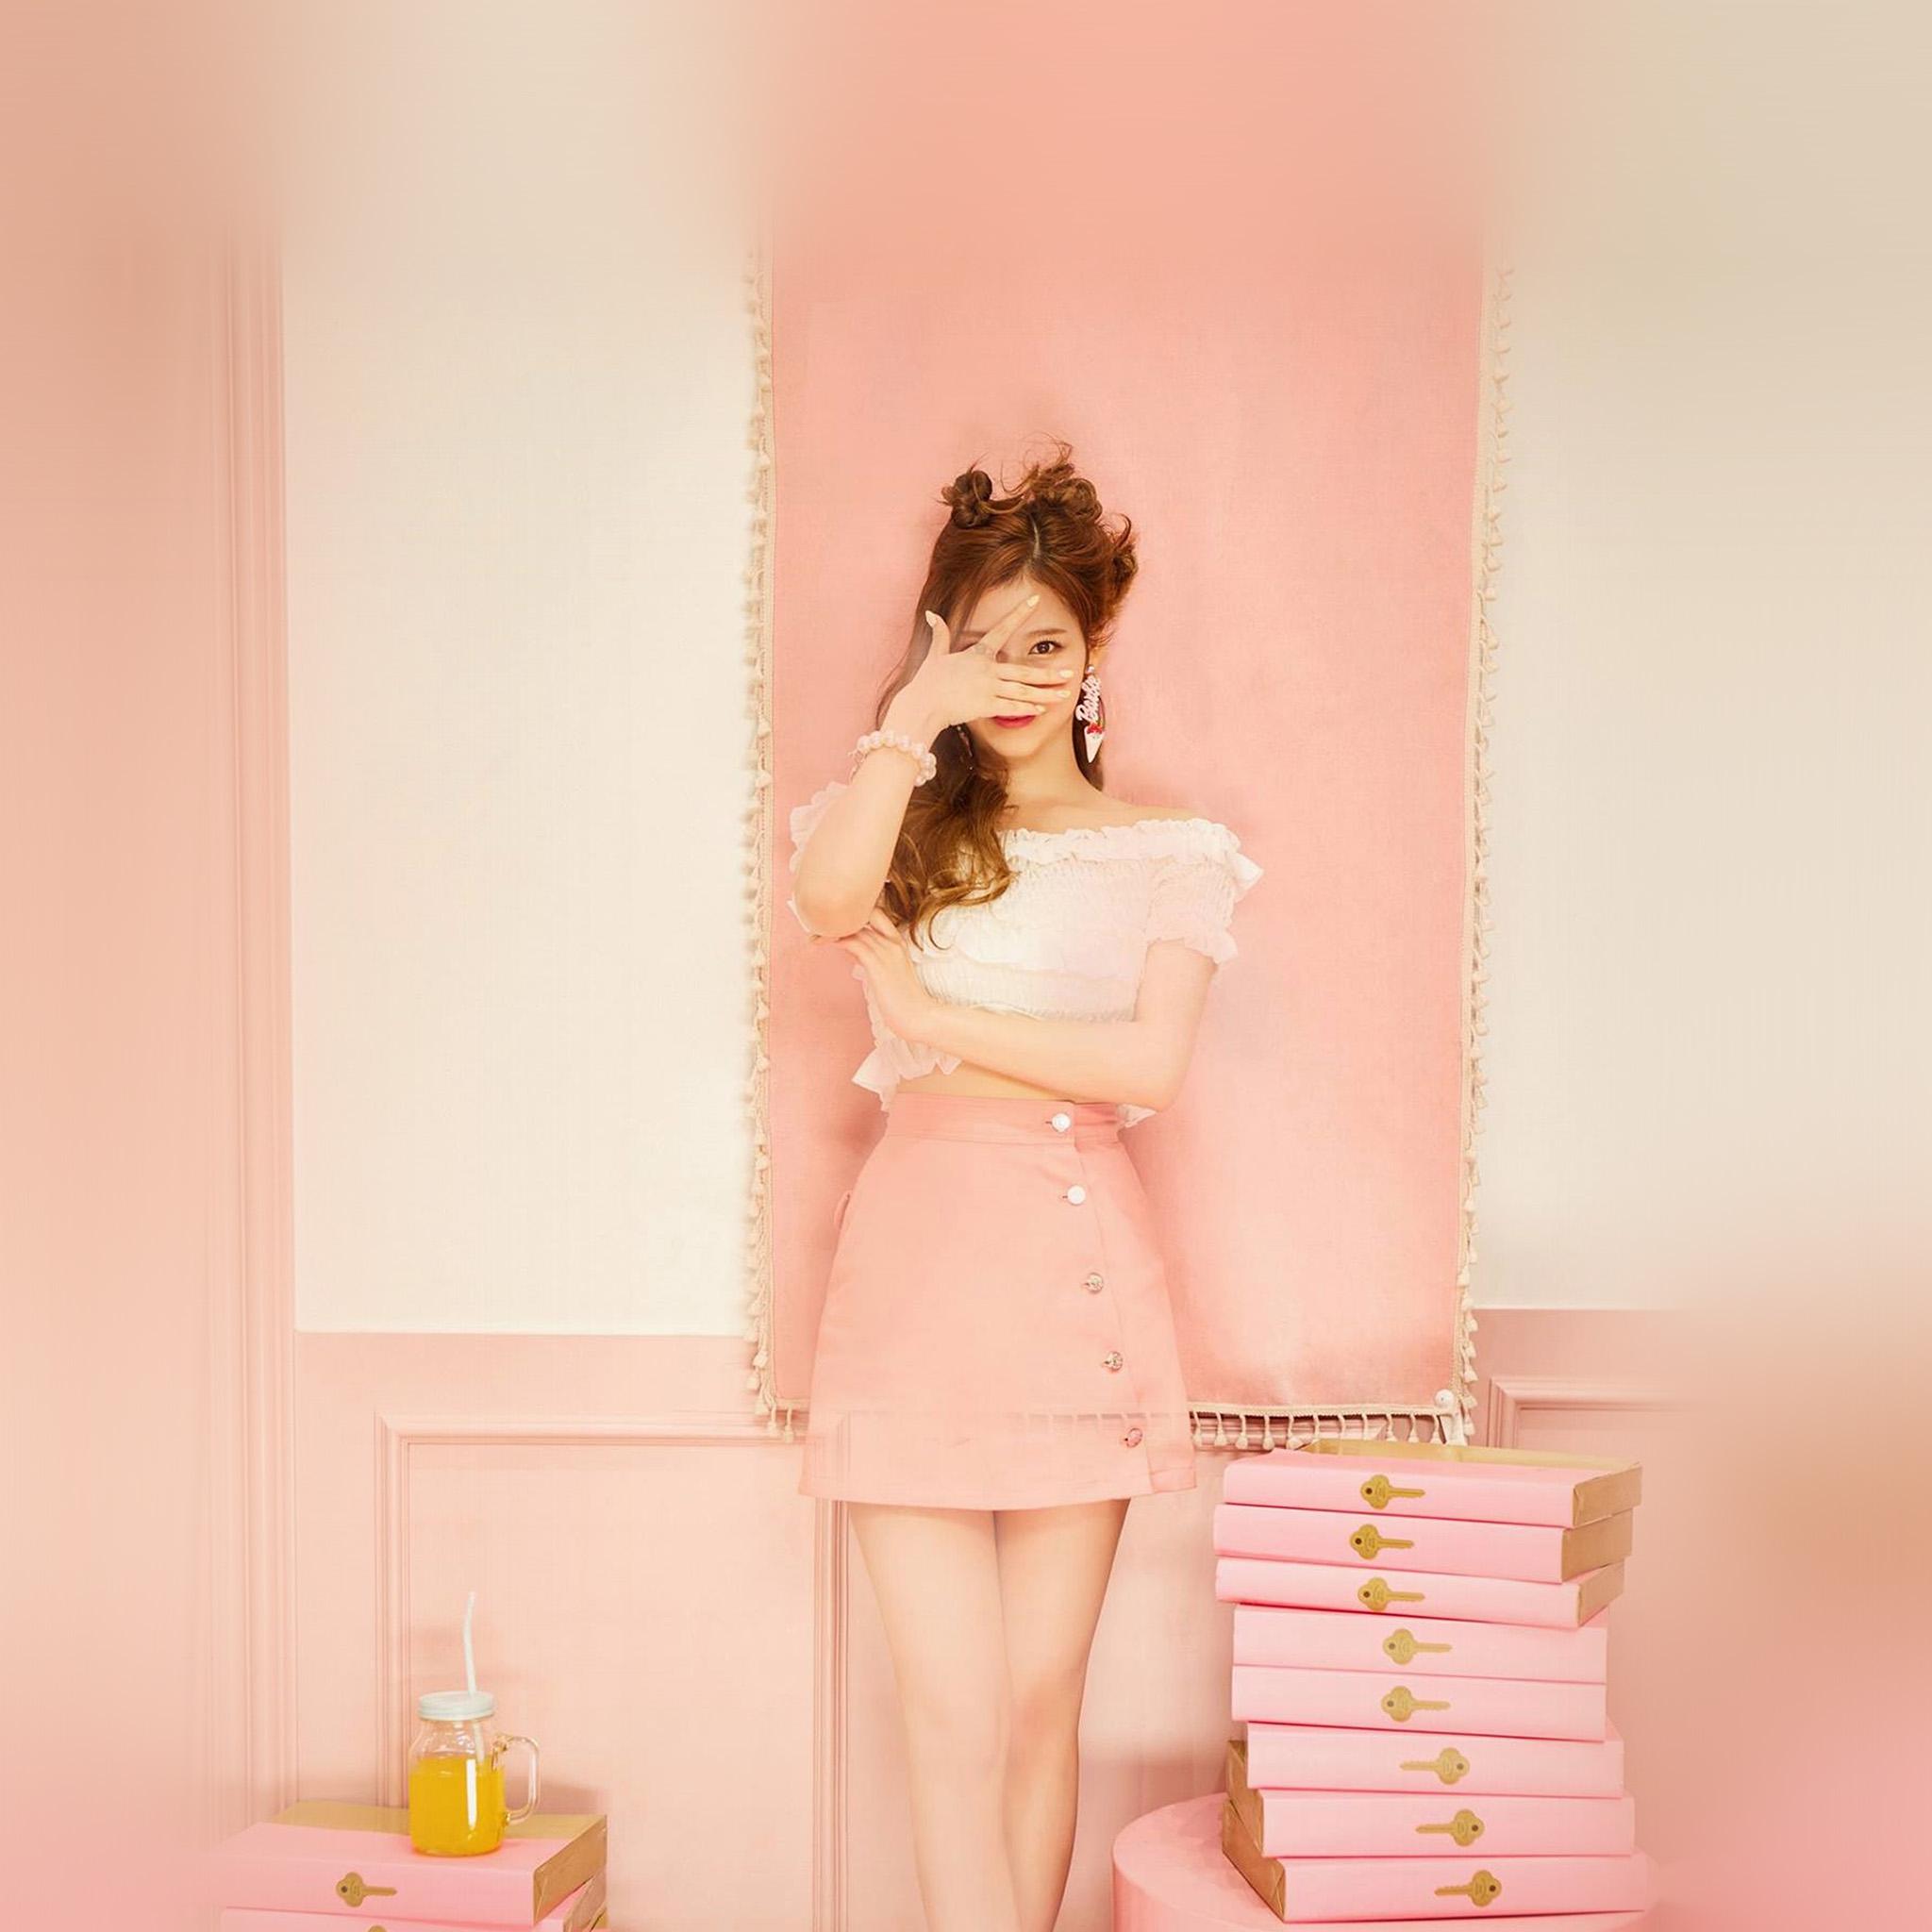 Samsung Galaxy Girl Wallpaper Hn12 Sana Girl Twice Kpop Cute Pink Wallpaper